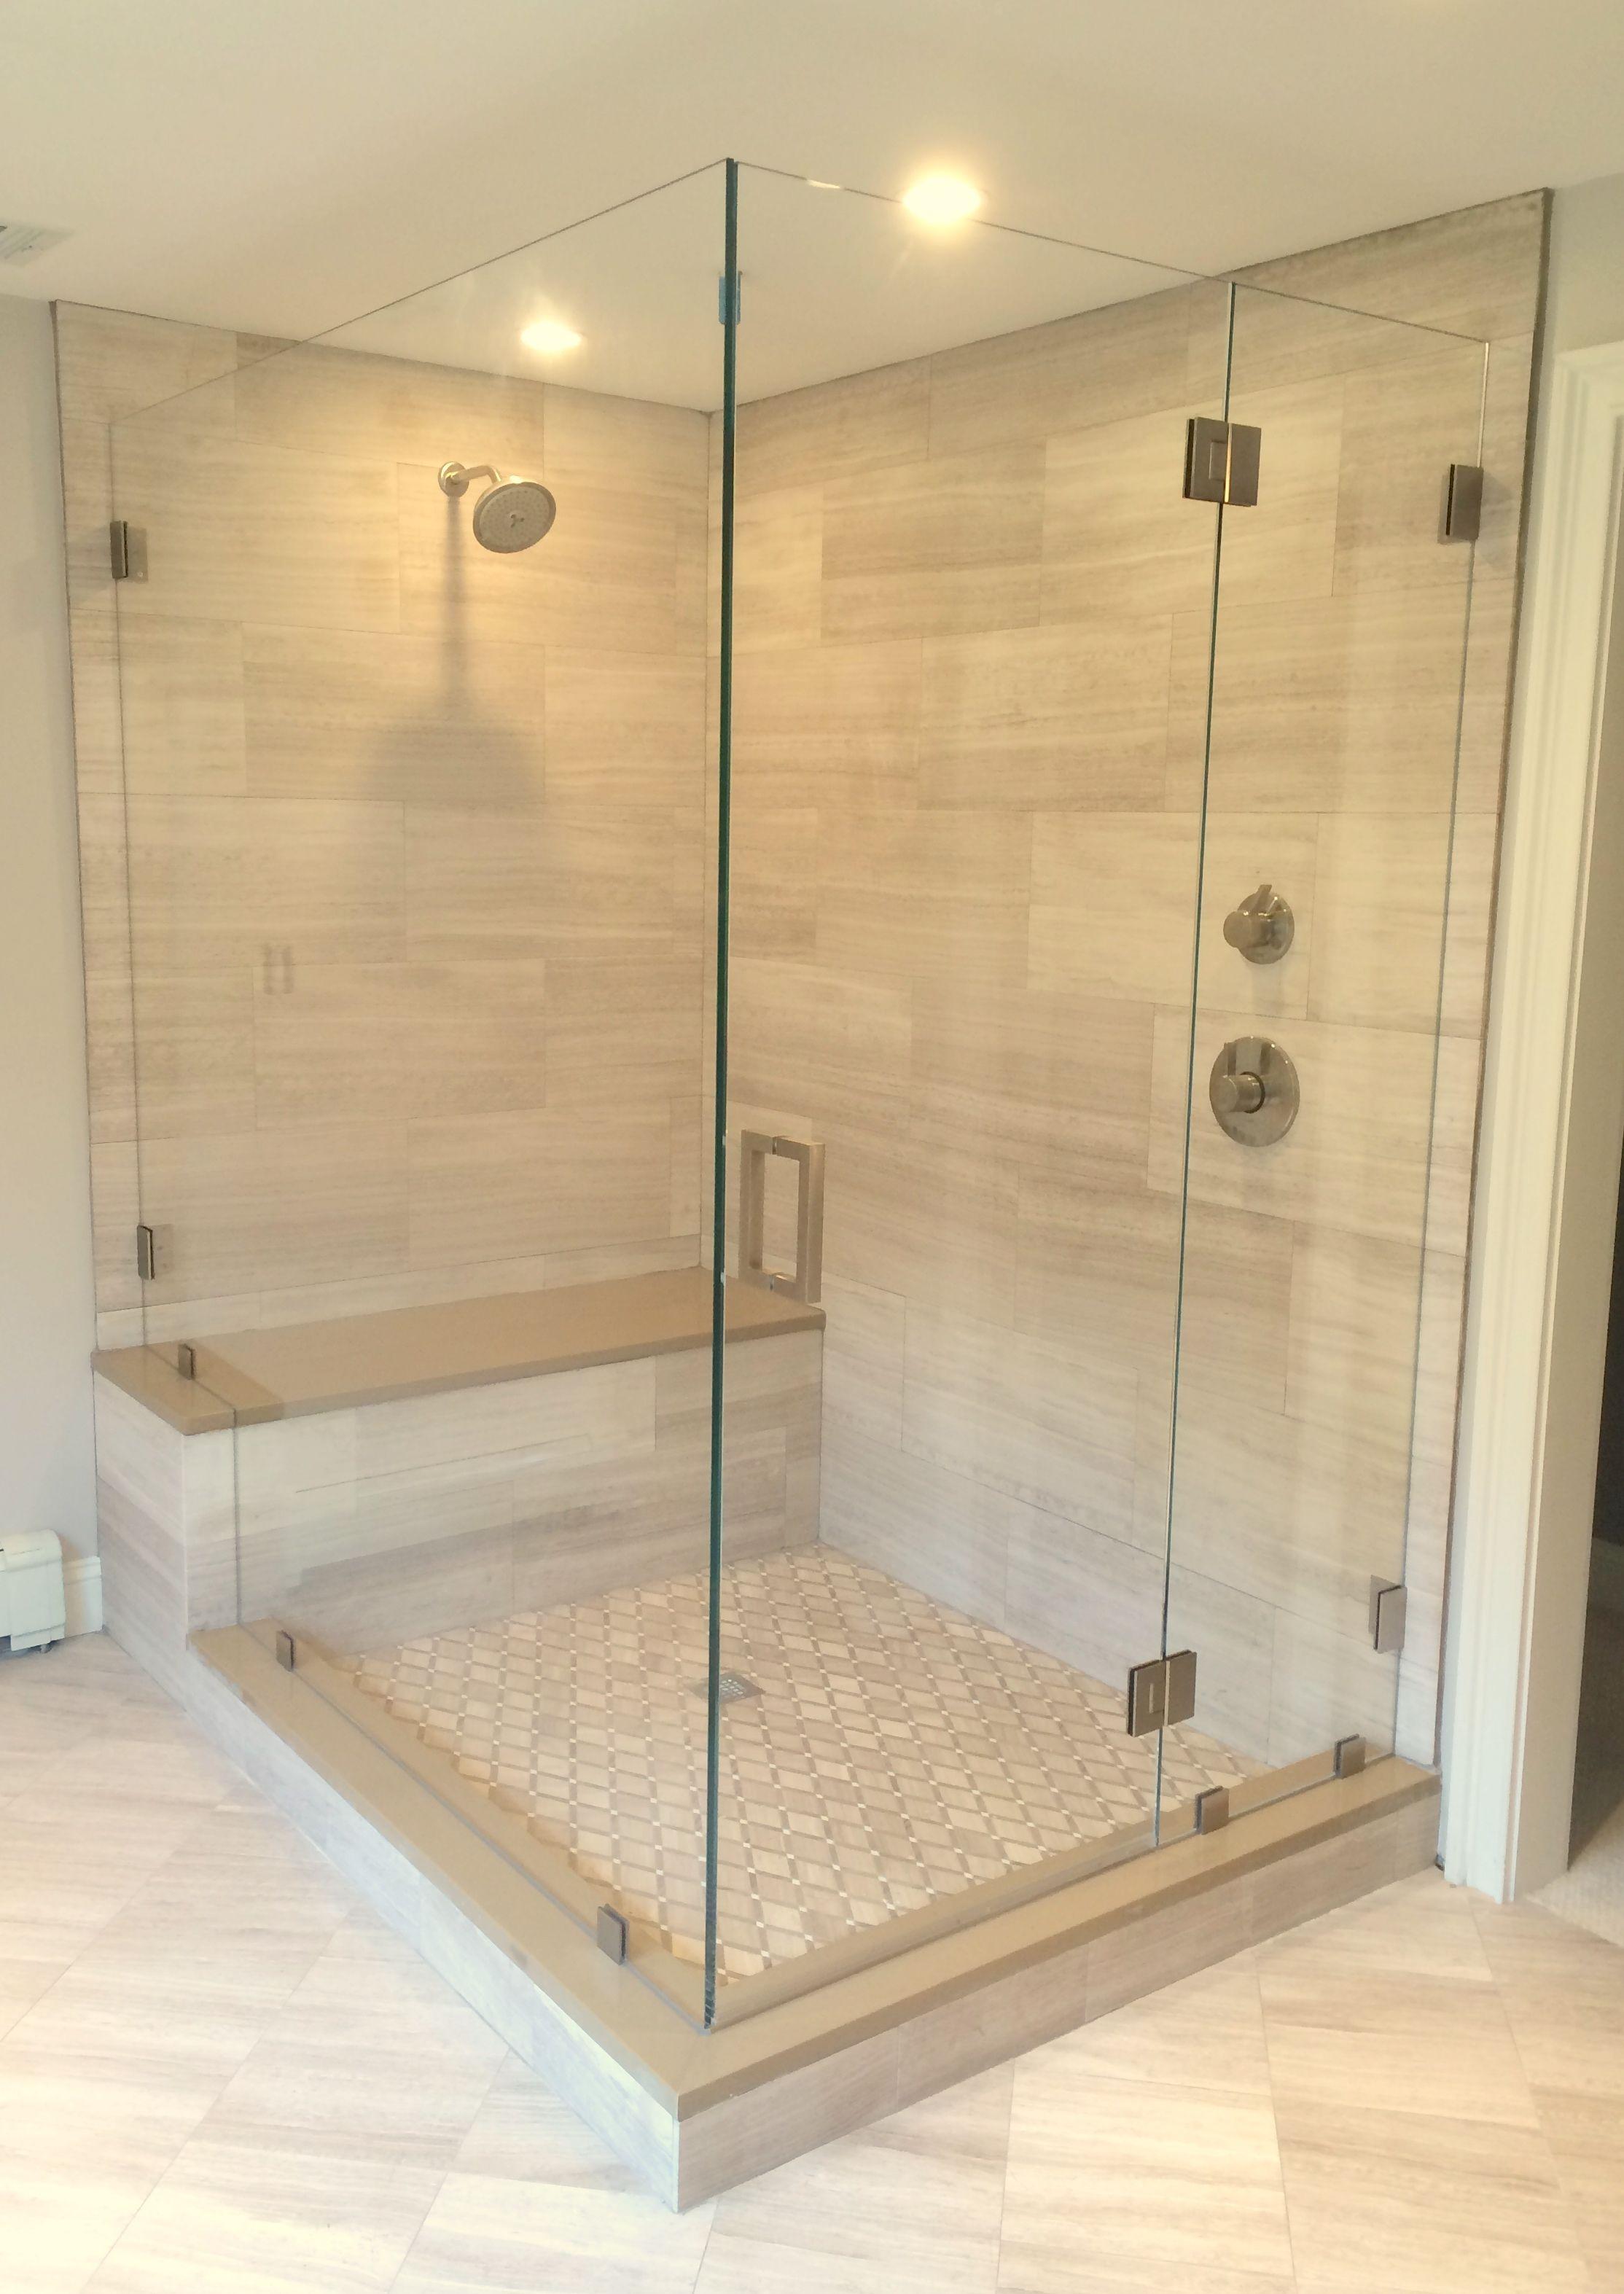 Spacious And Elegant This Frameless Shower Door Has Plenty Of